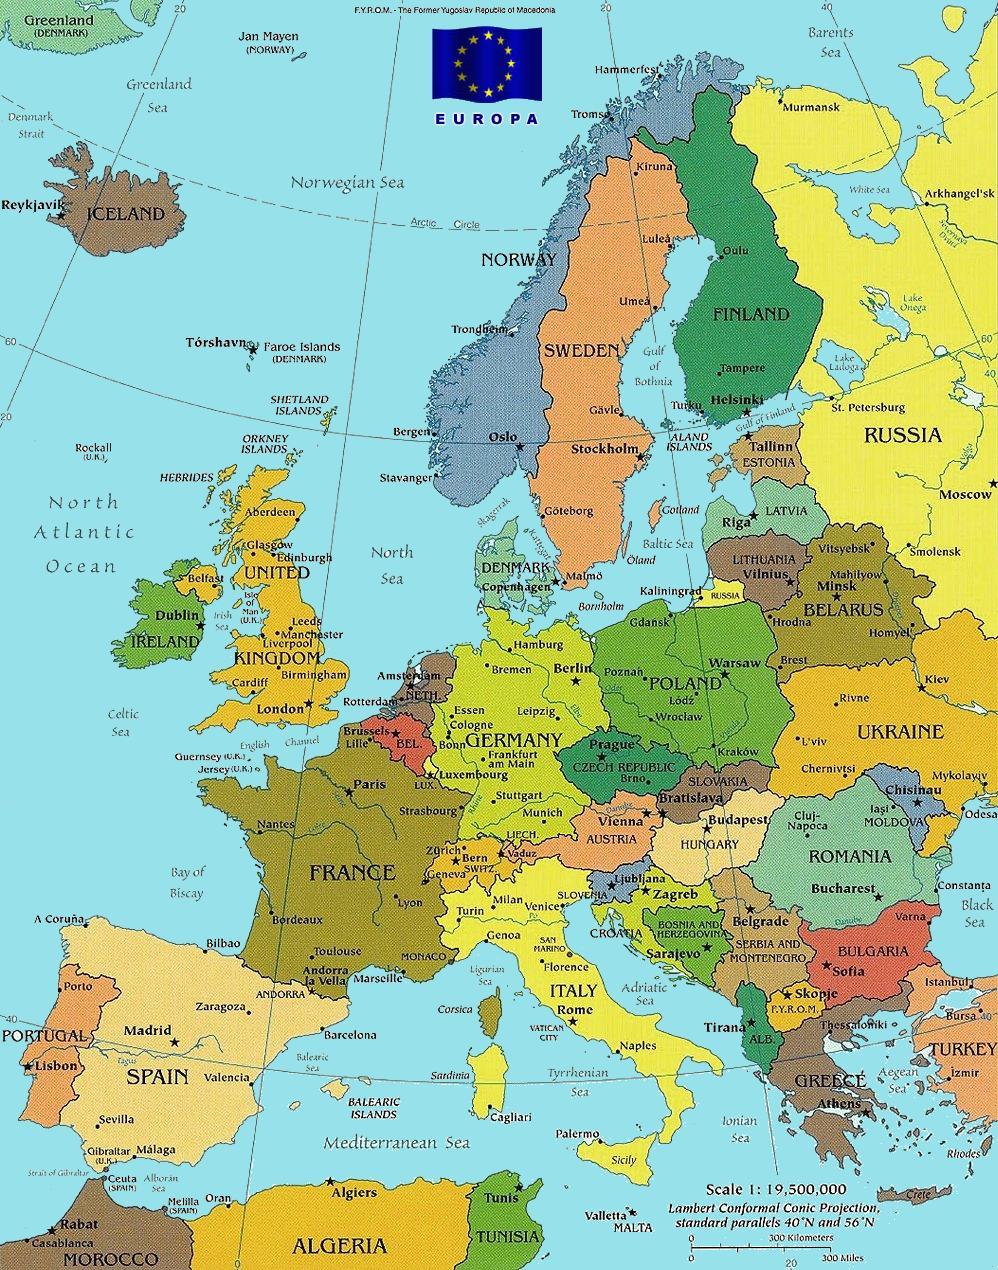 http://1.bp.blogspot.com/_lTut1EHki3c/TN8GJGS_1CI/AAAAAAAAAHs/cheWRHkcvaA/s1600/europe-map-of-europe-large-2008-muck-hole.jpg